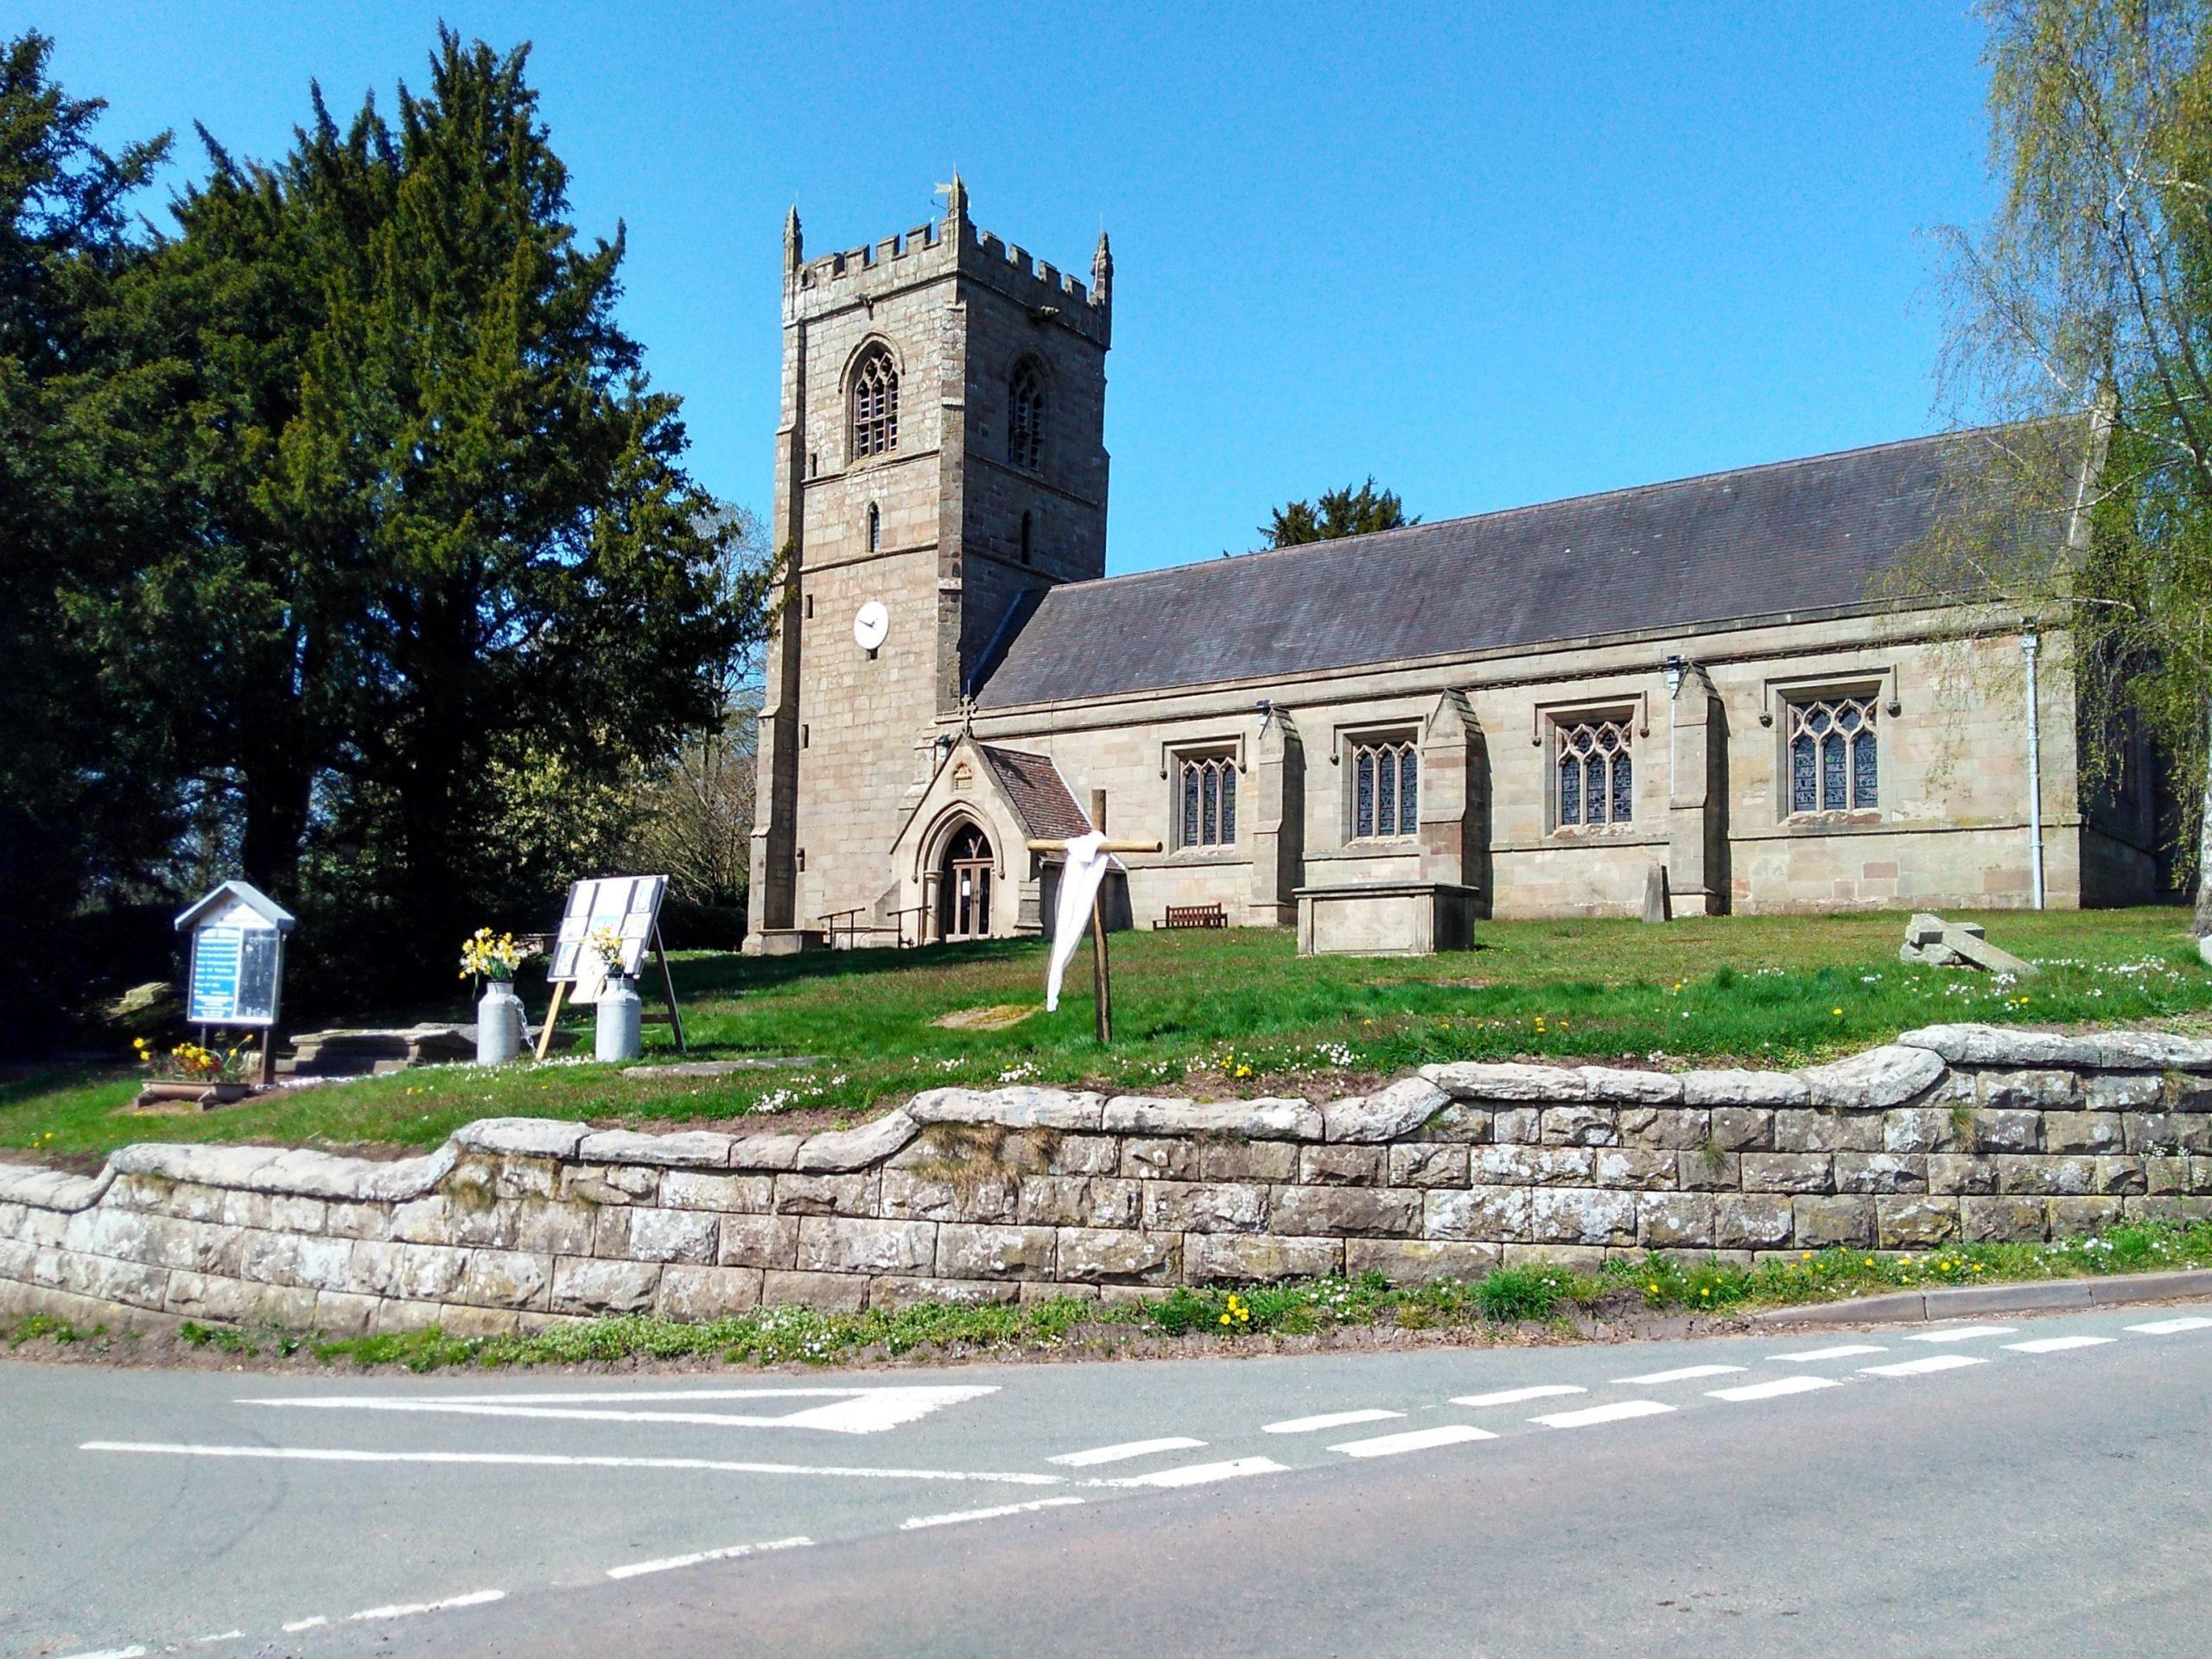 Mucklestone Church in Loggerheads Parish Staffordshire